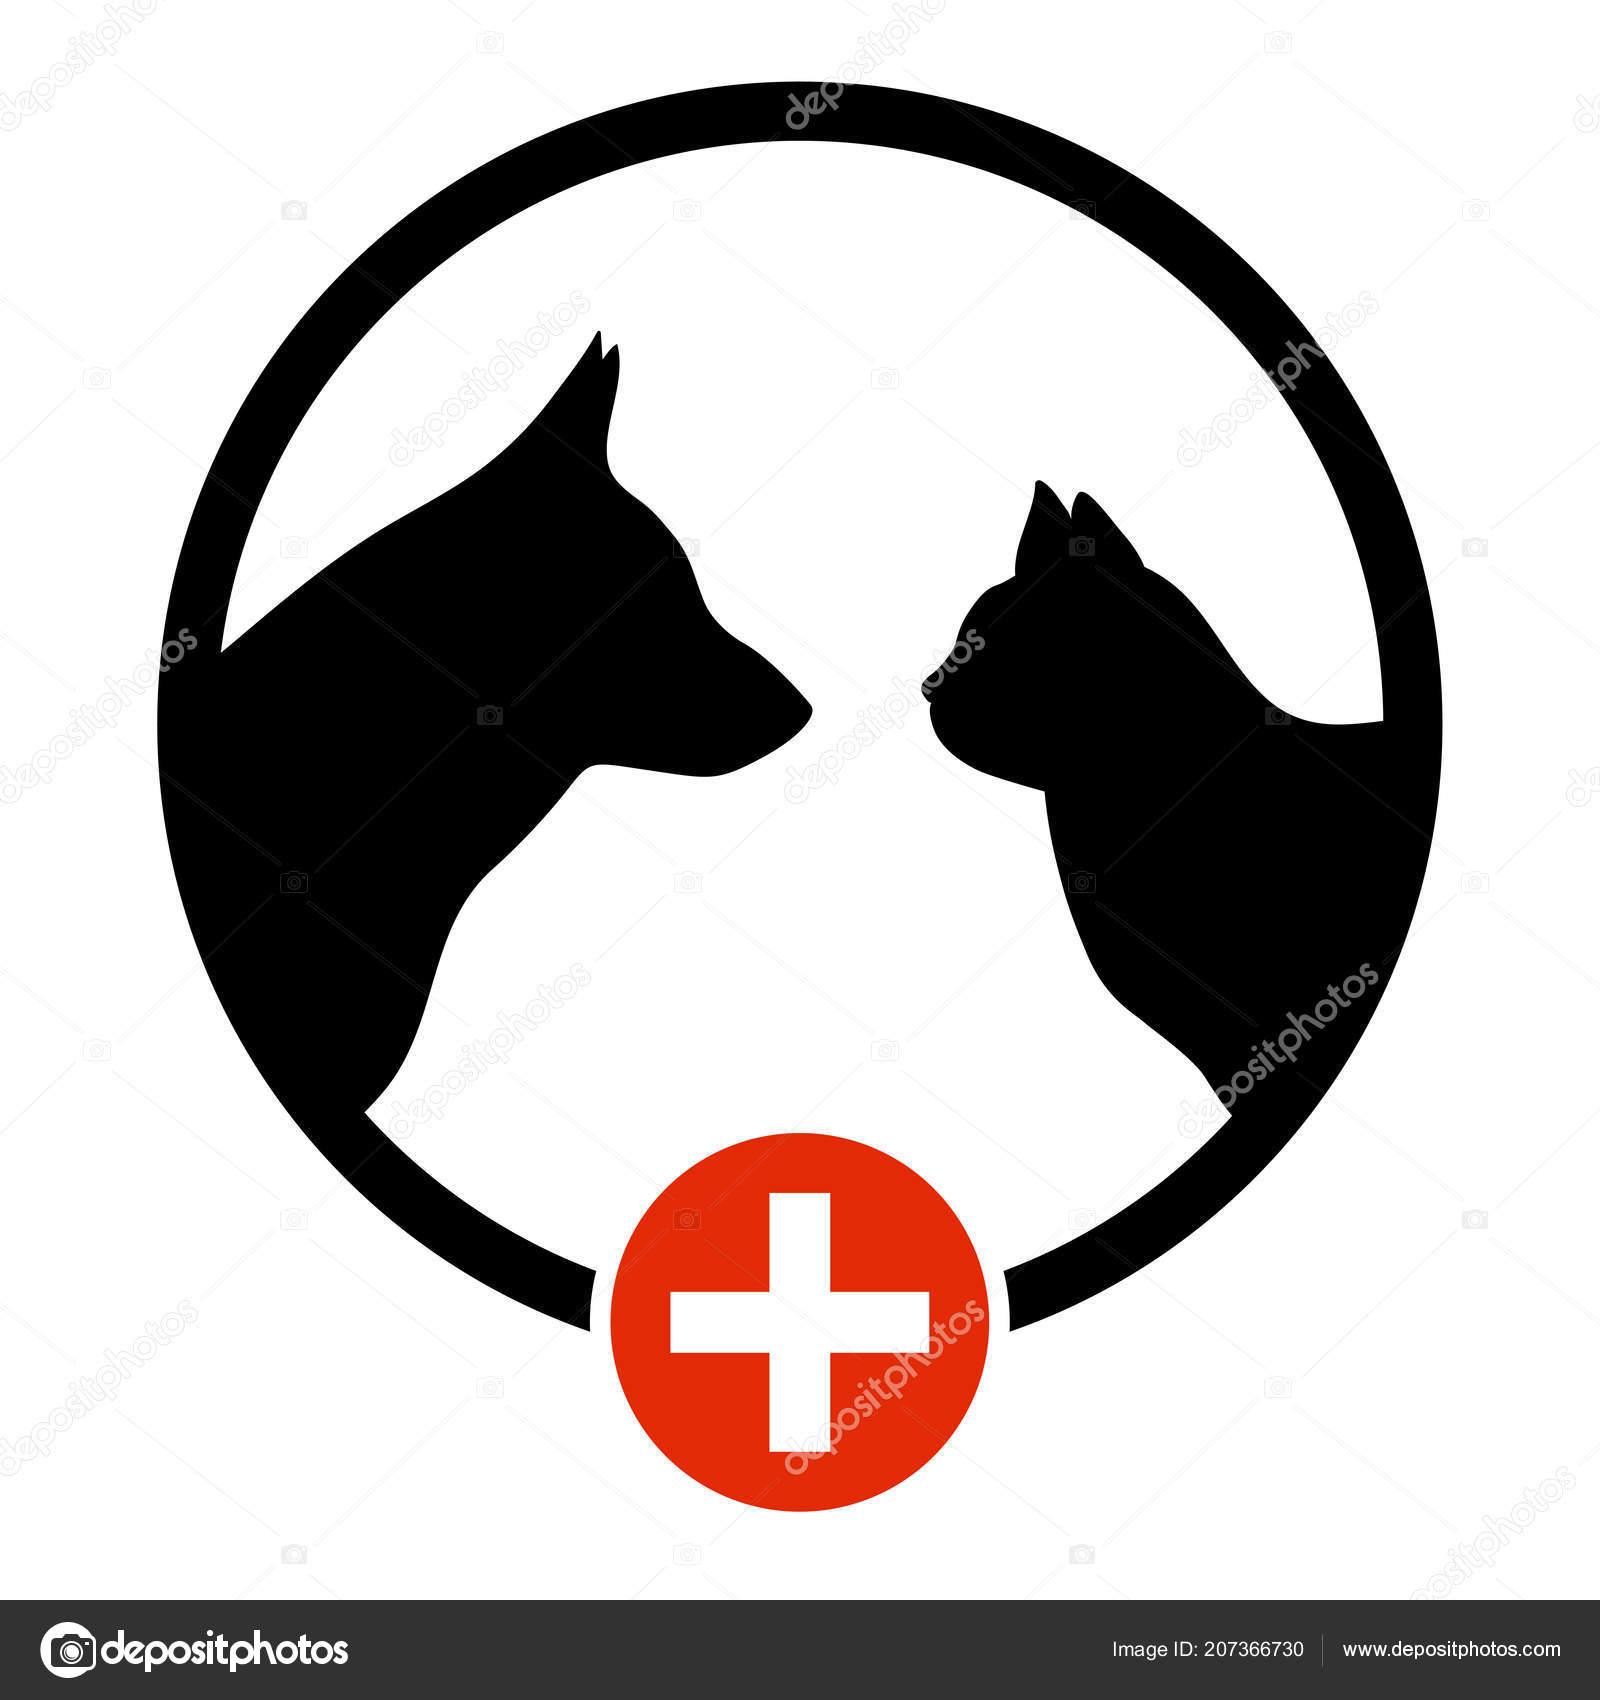 cão gato logo silhueta para negócios animais baby sitter animal